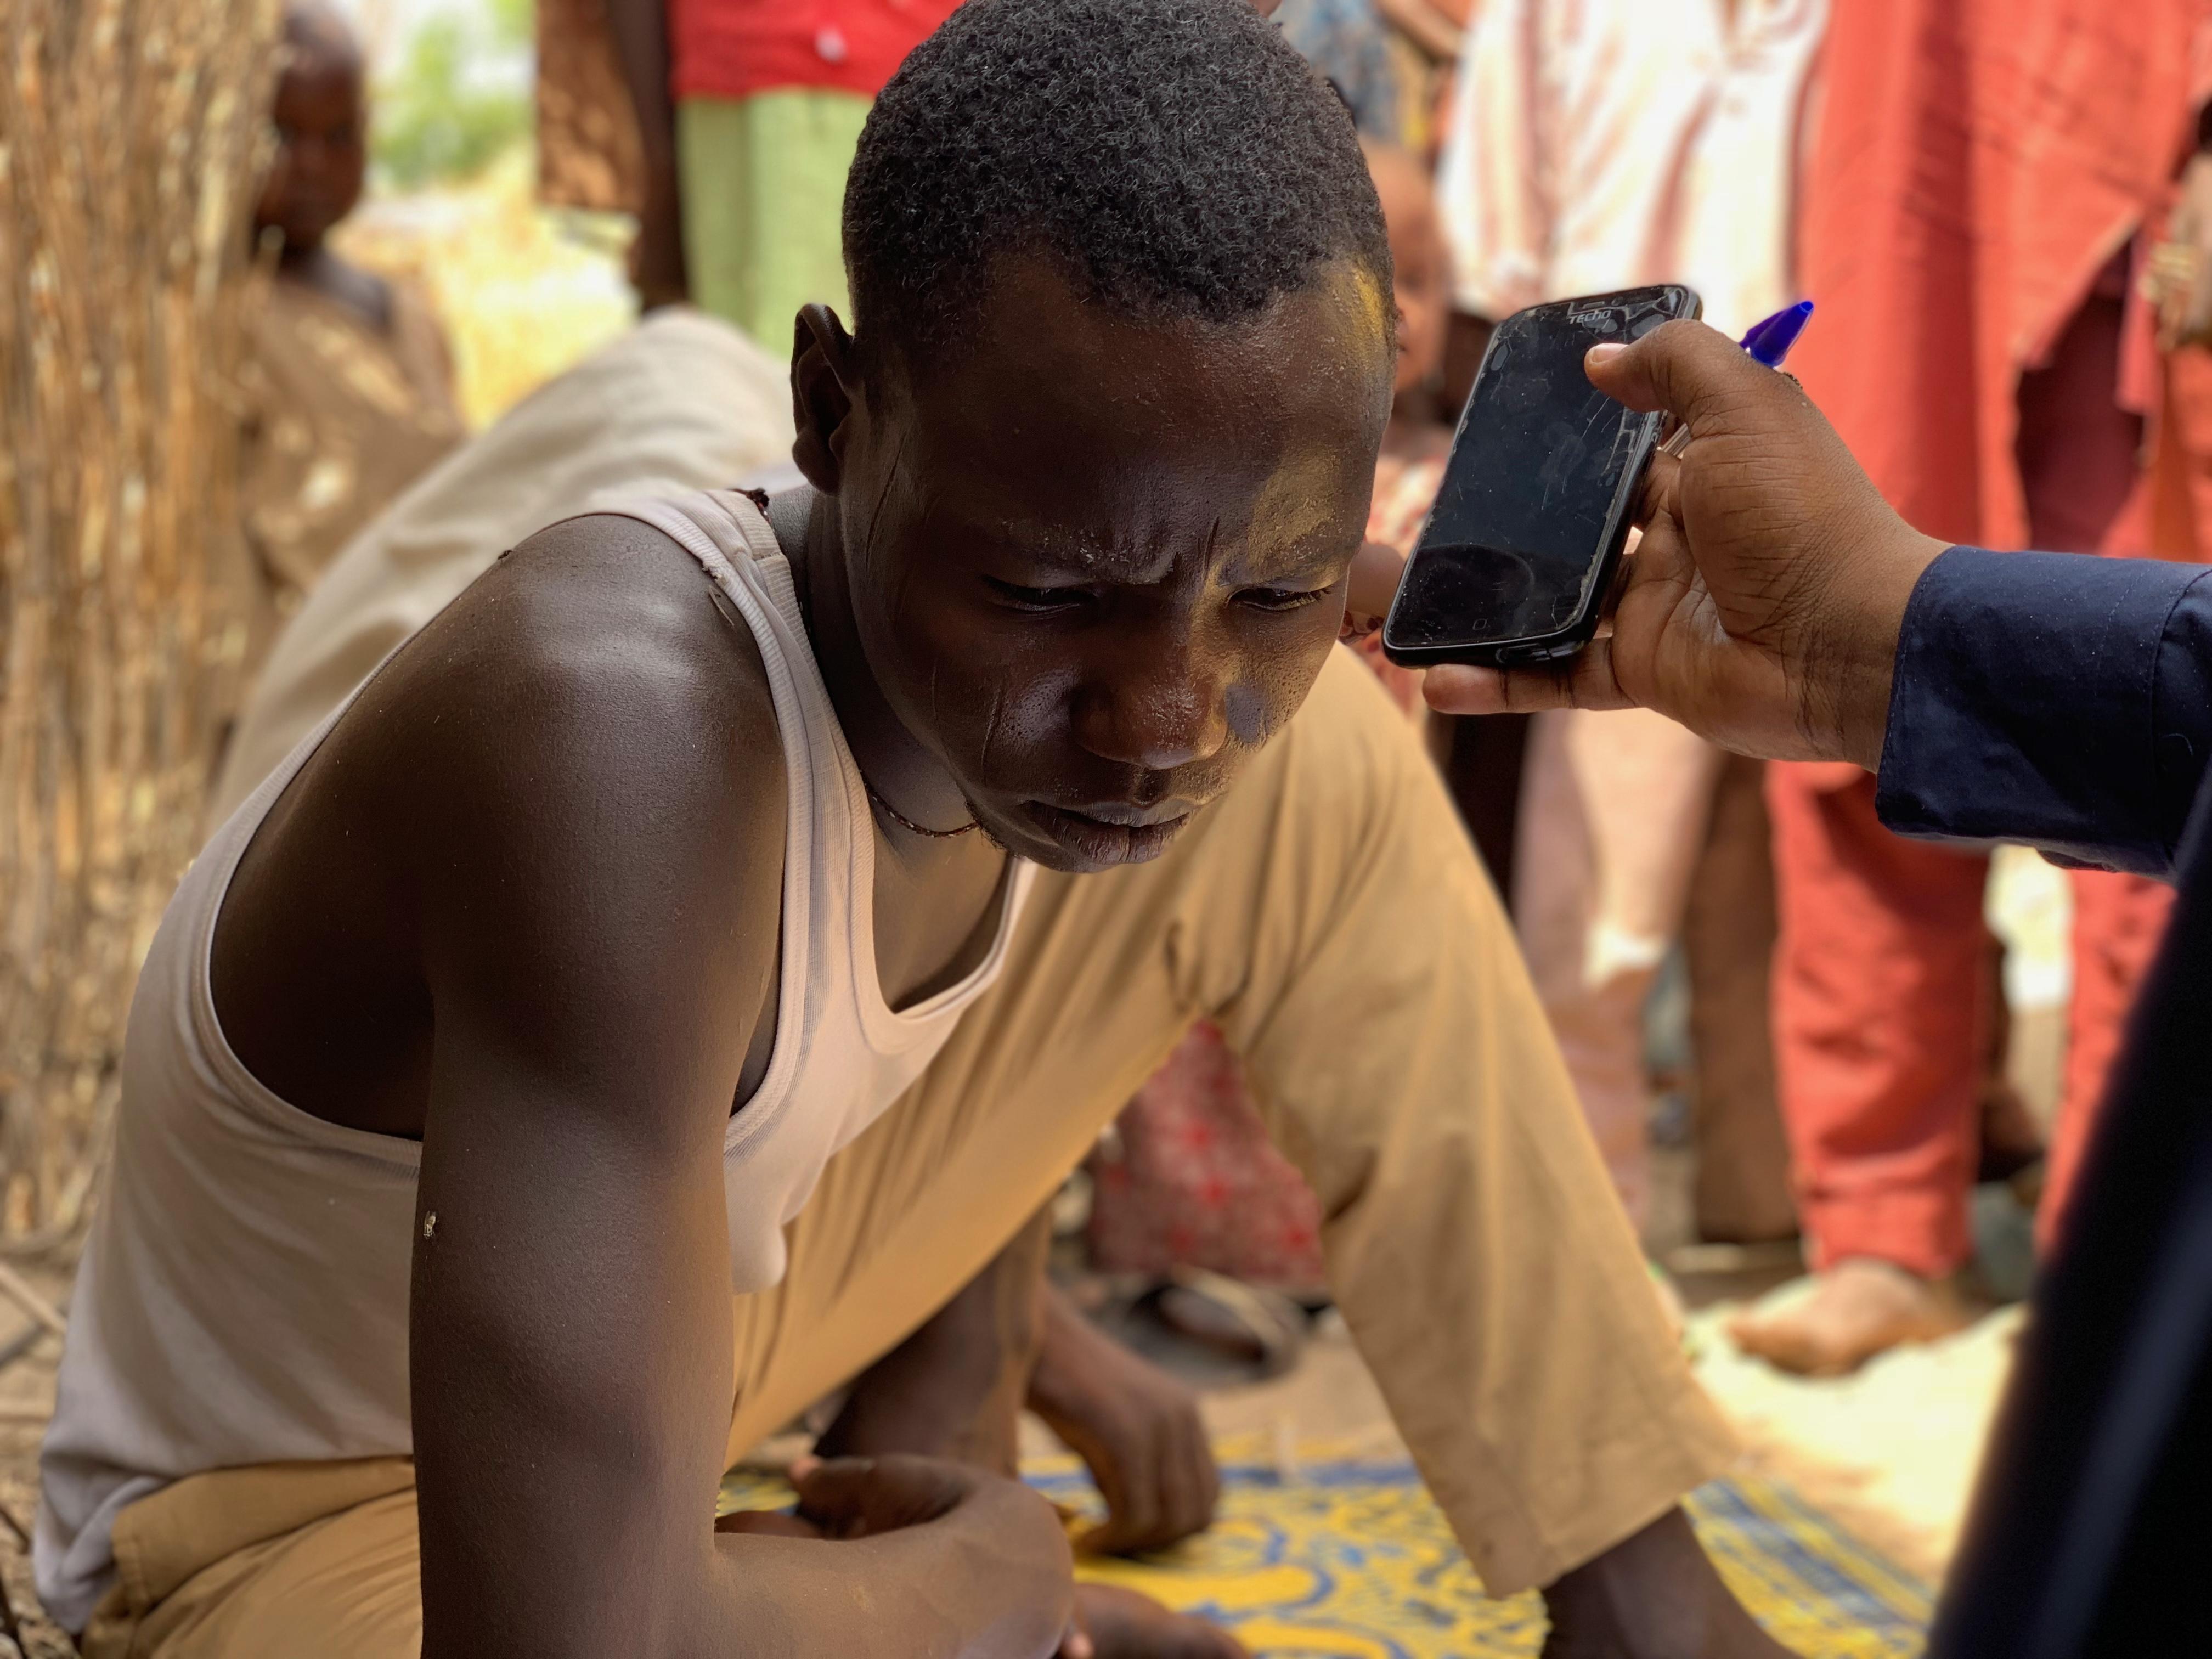 TWB's Response in Nigeria